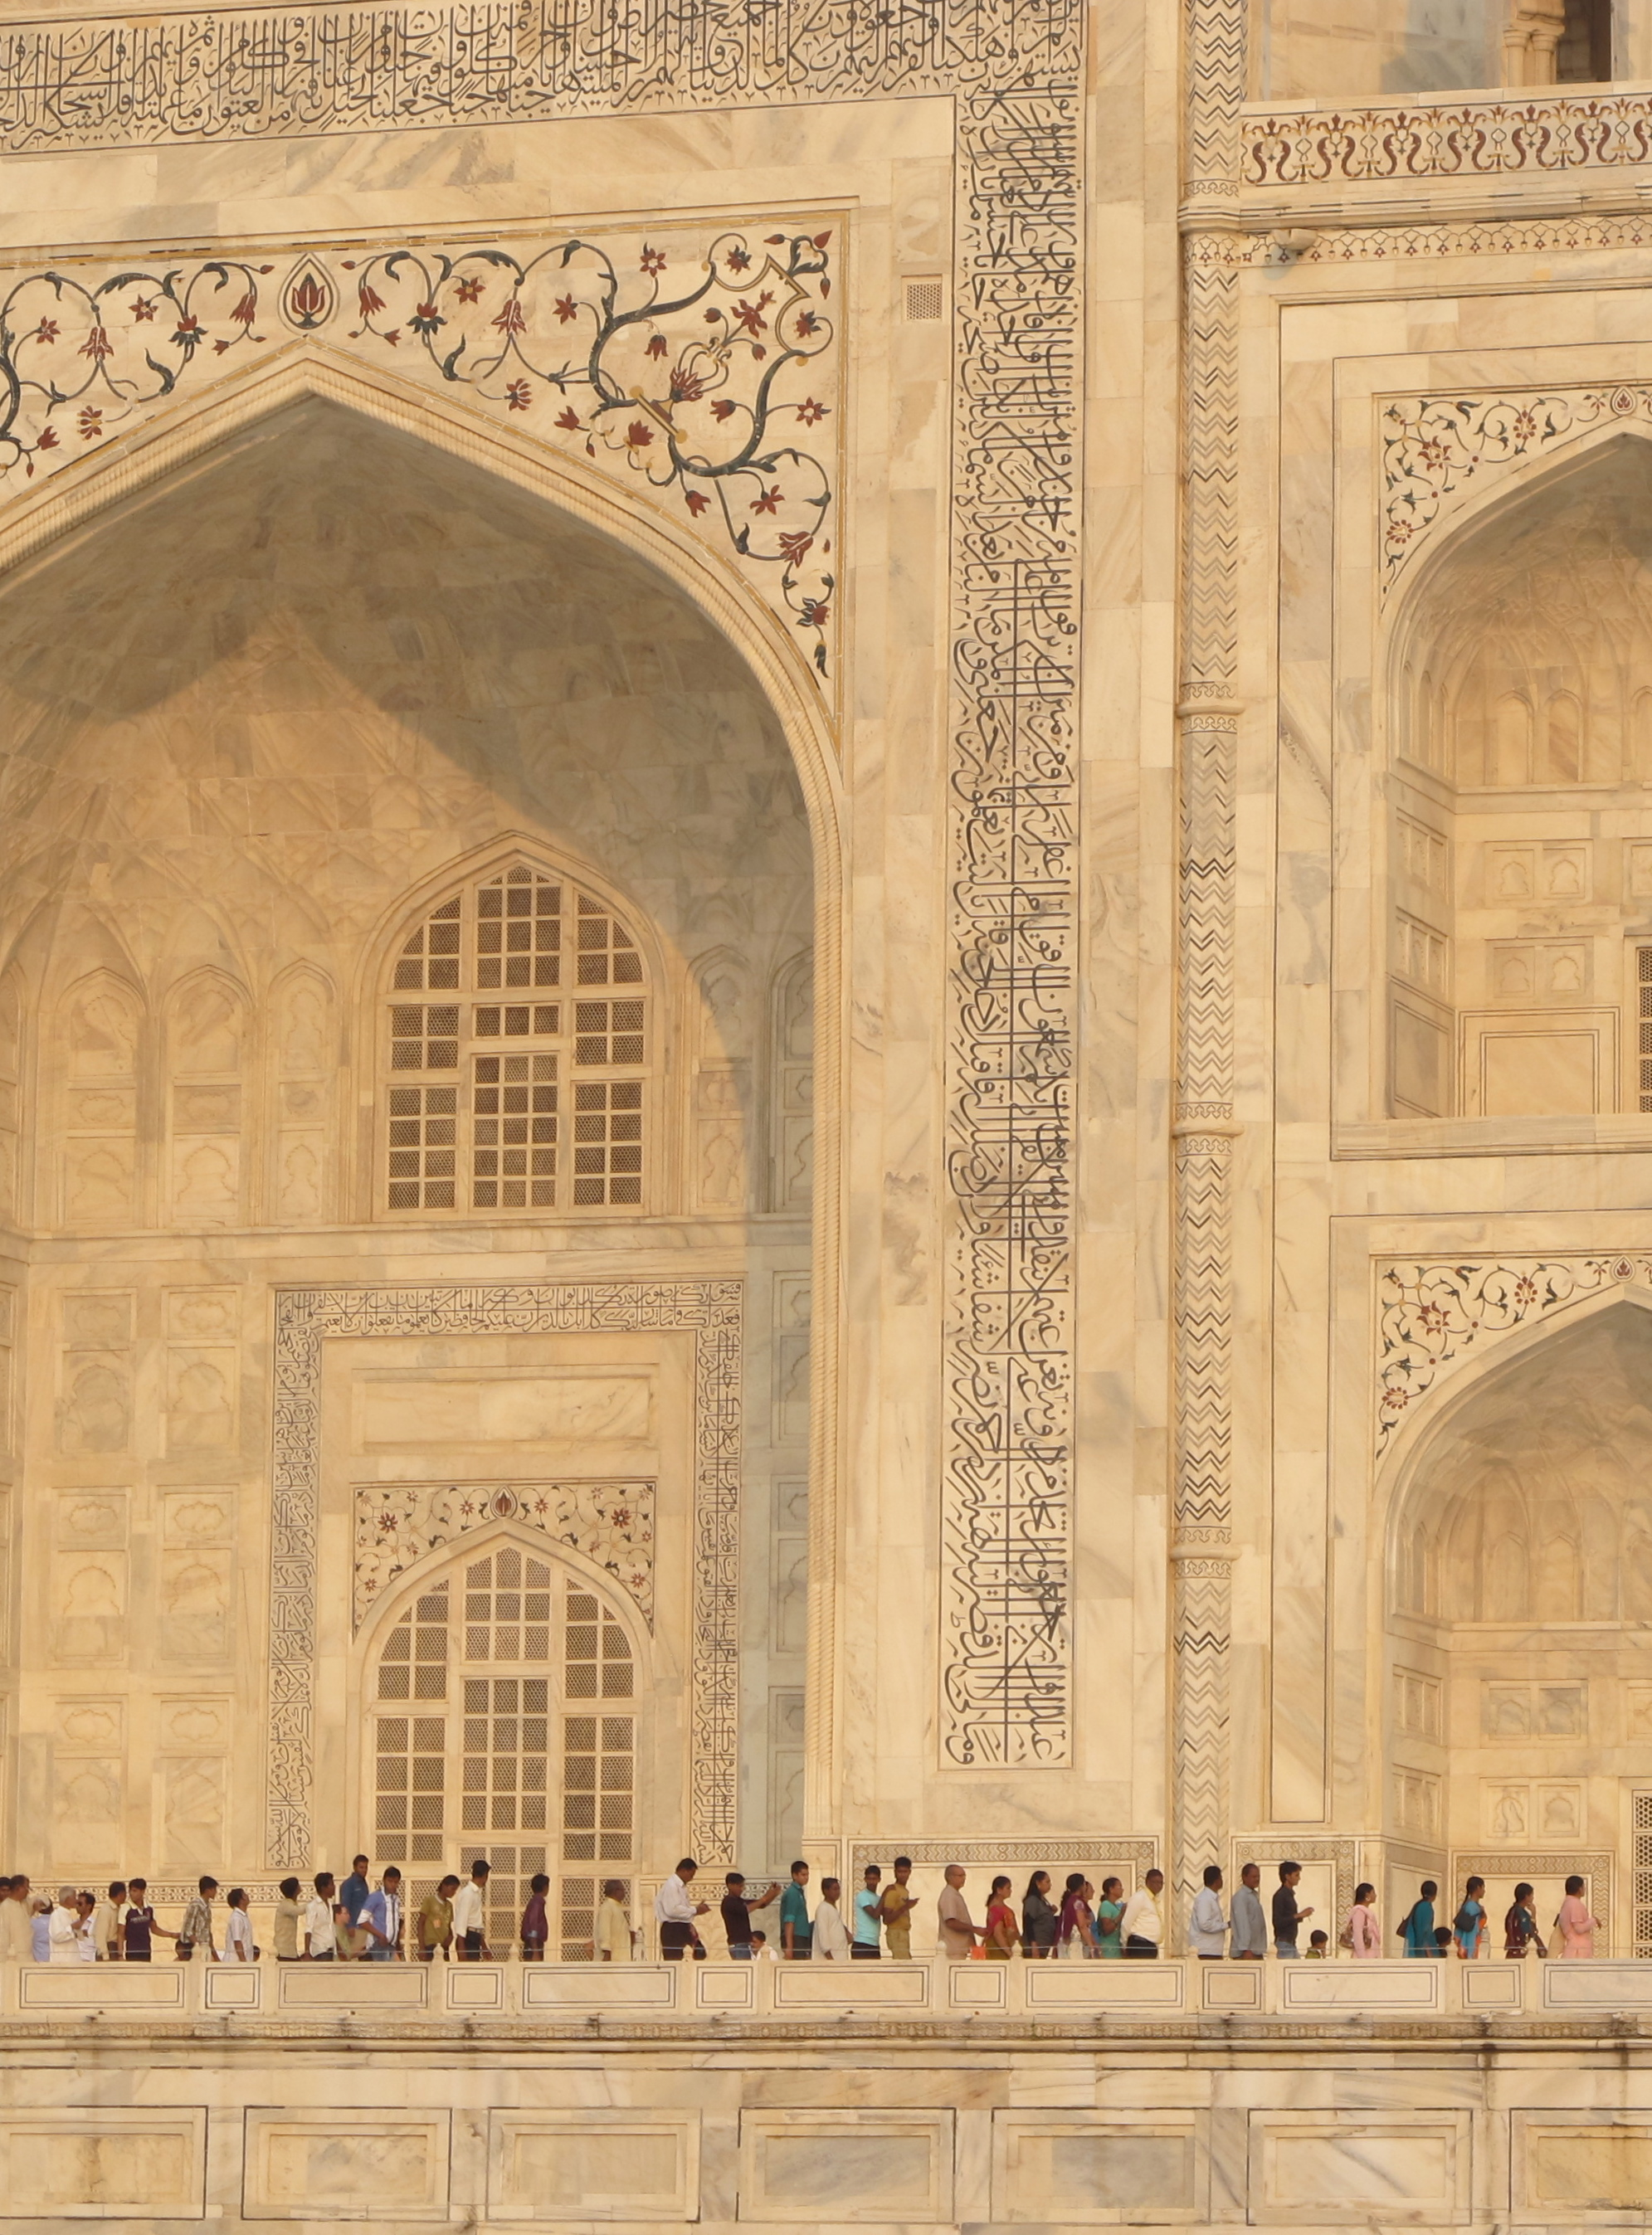 Queue - Taj Mahal - Agra - India